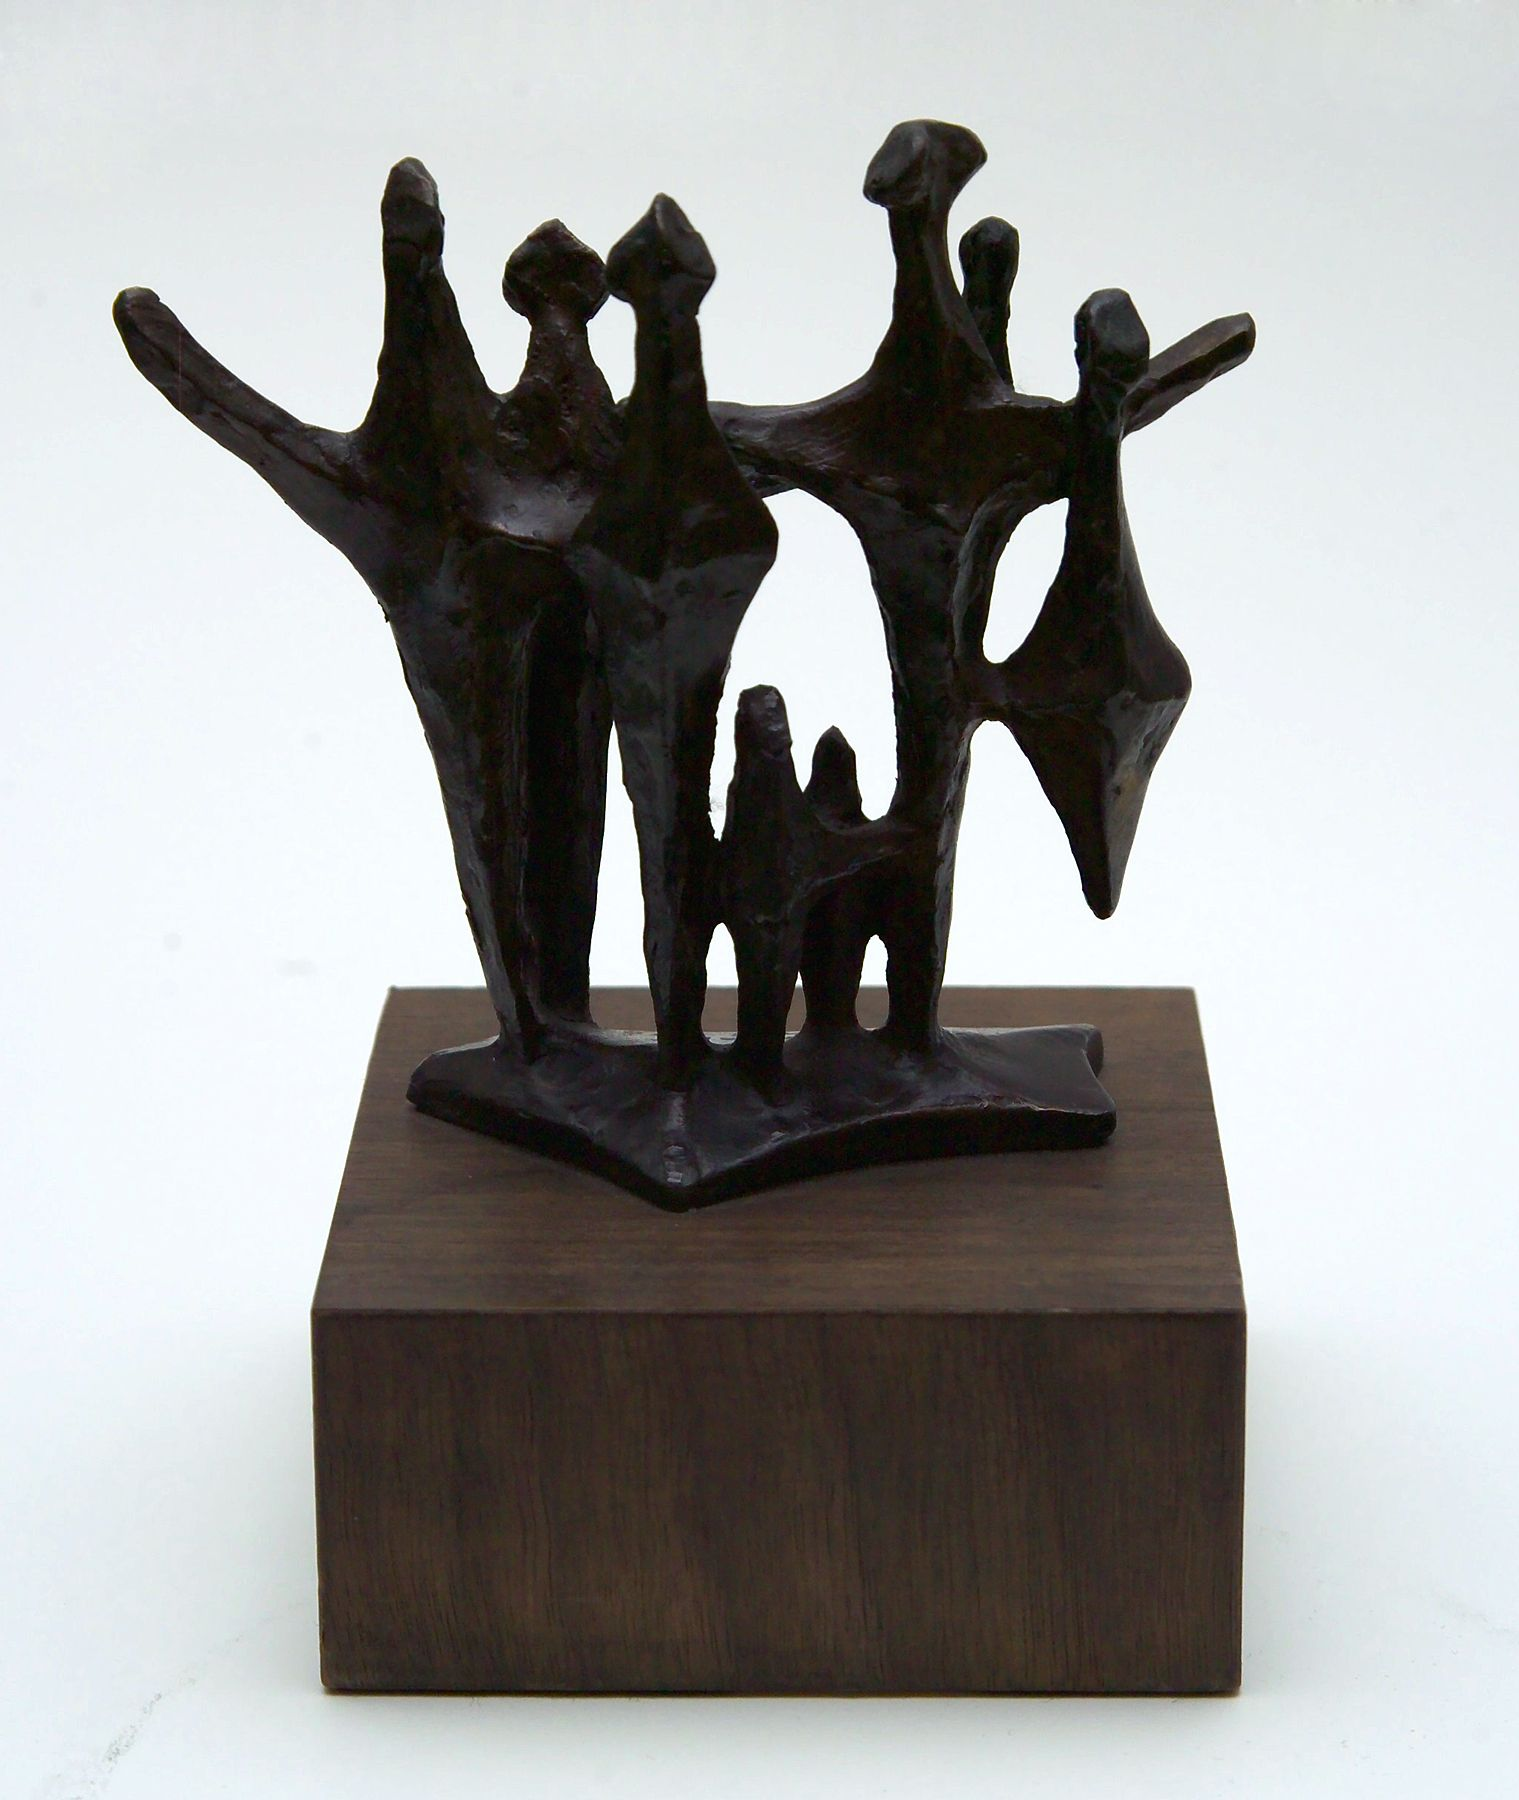 Chaim Gross, Shabbot Angels, 1973, bronze, 5 1/2 X 6 X 2 3/4 inches